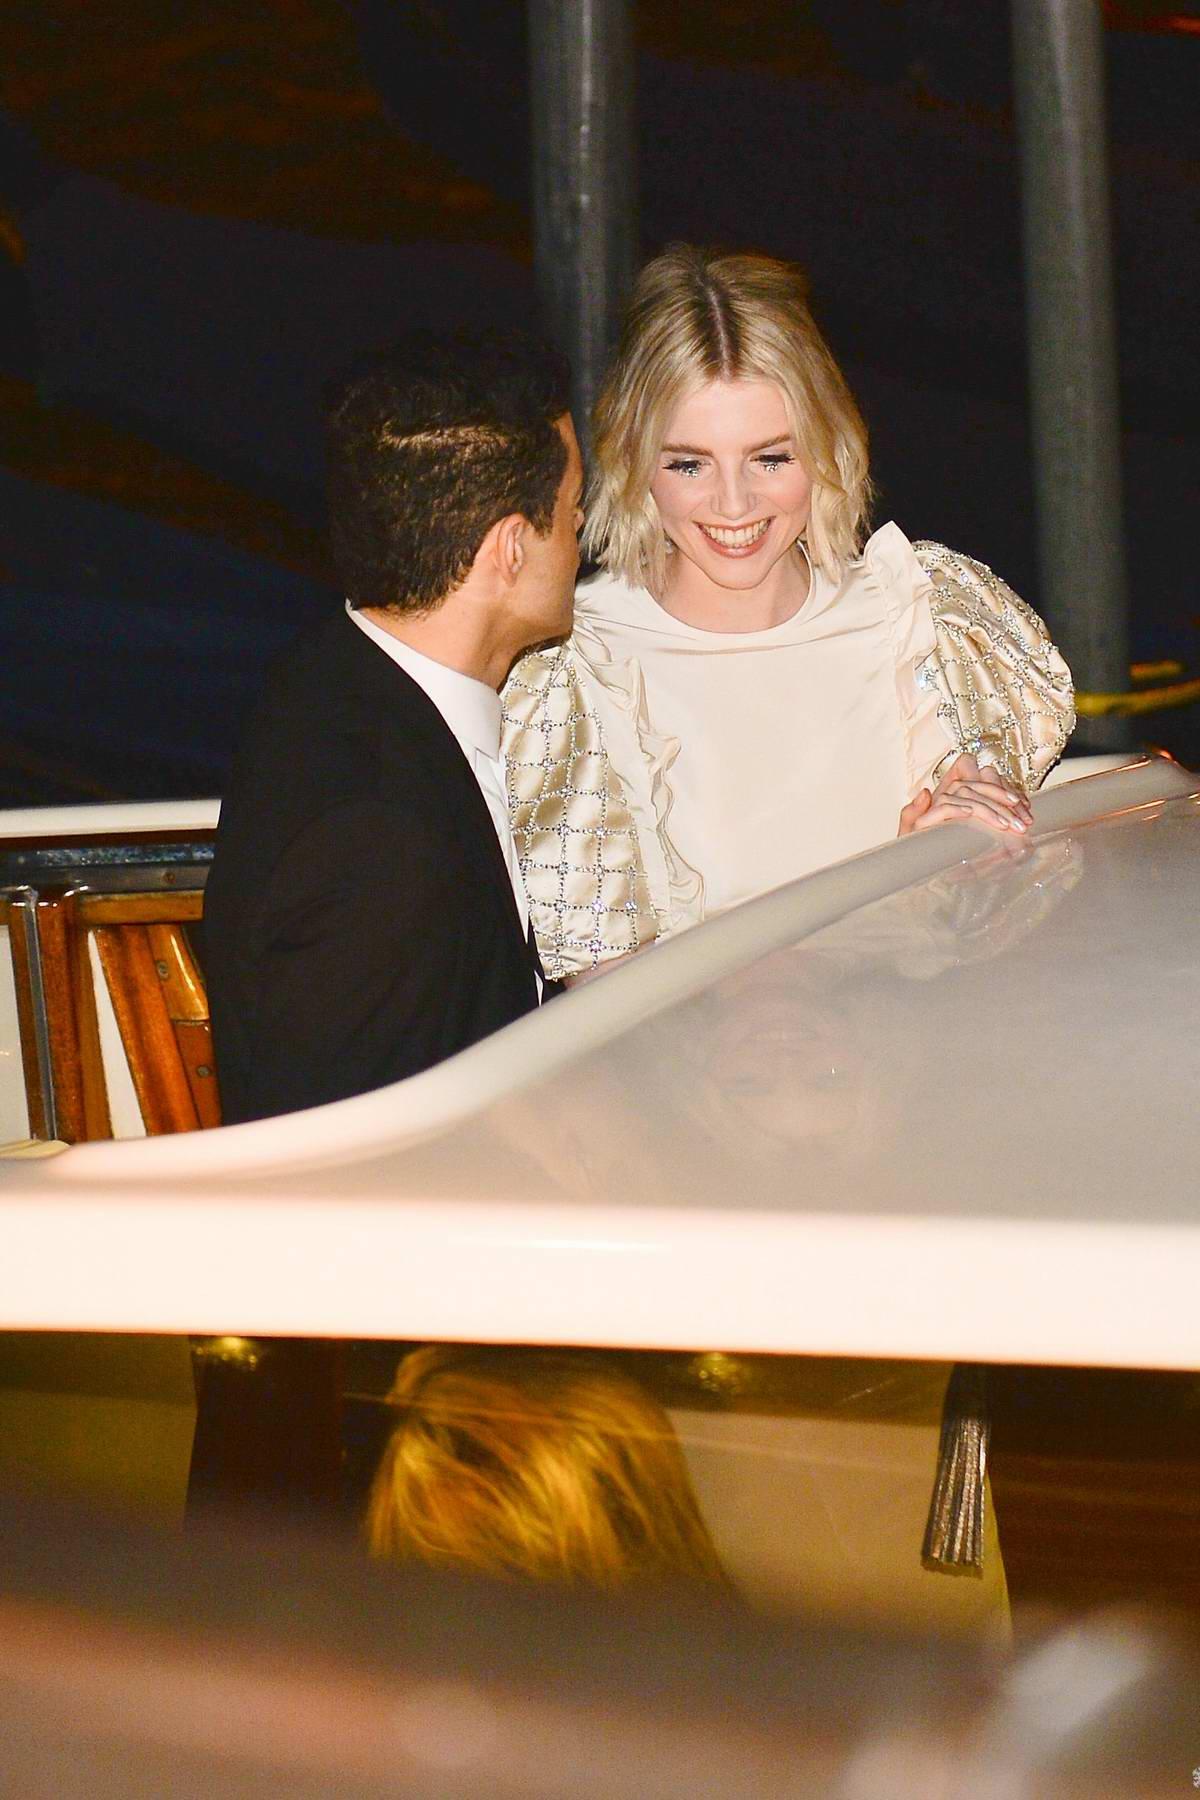 Lucy Boynton and Rami Malek enjoy a romantic dinner date in Venice, Italy